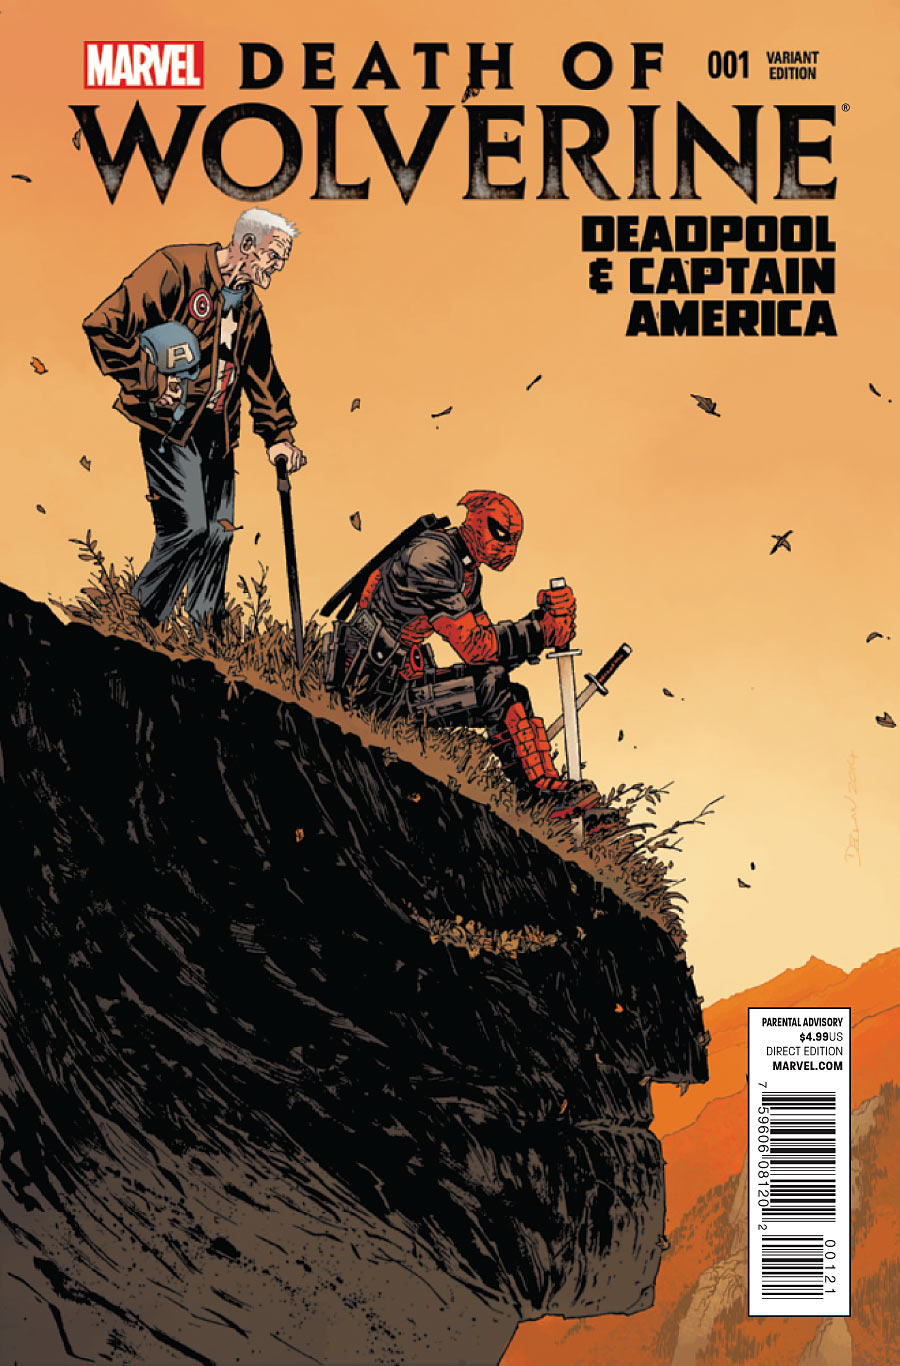 Death of Wolverine Deadpool & Captain America #1 variant 2